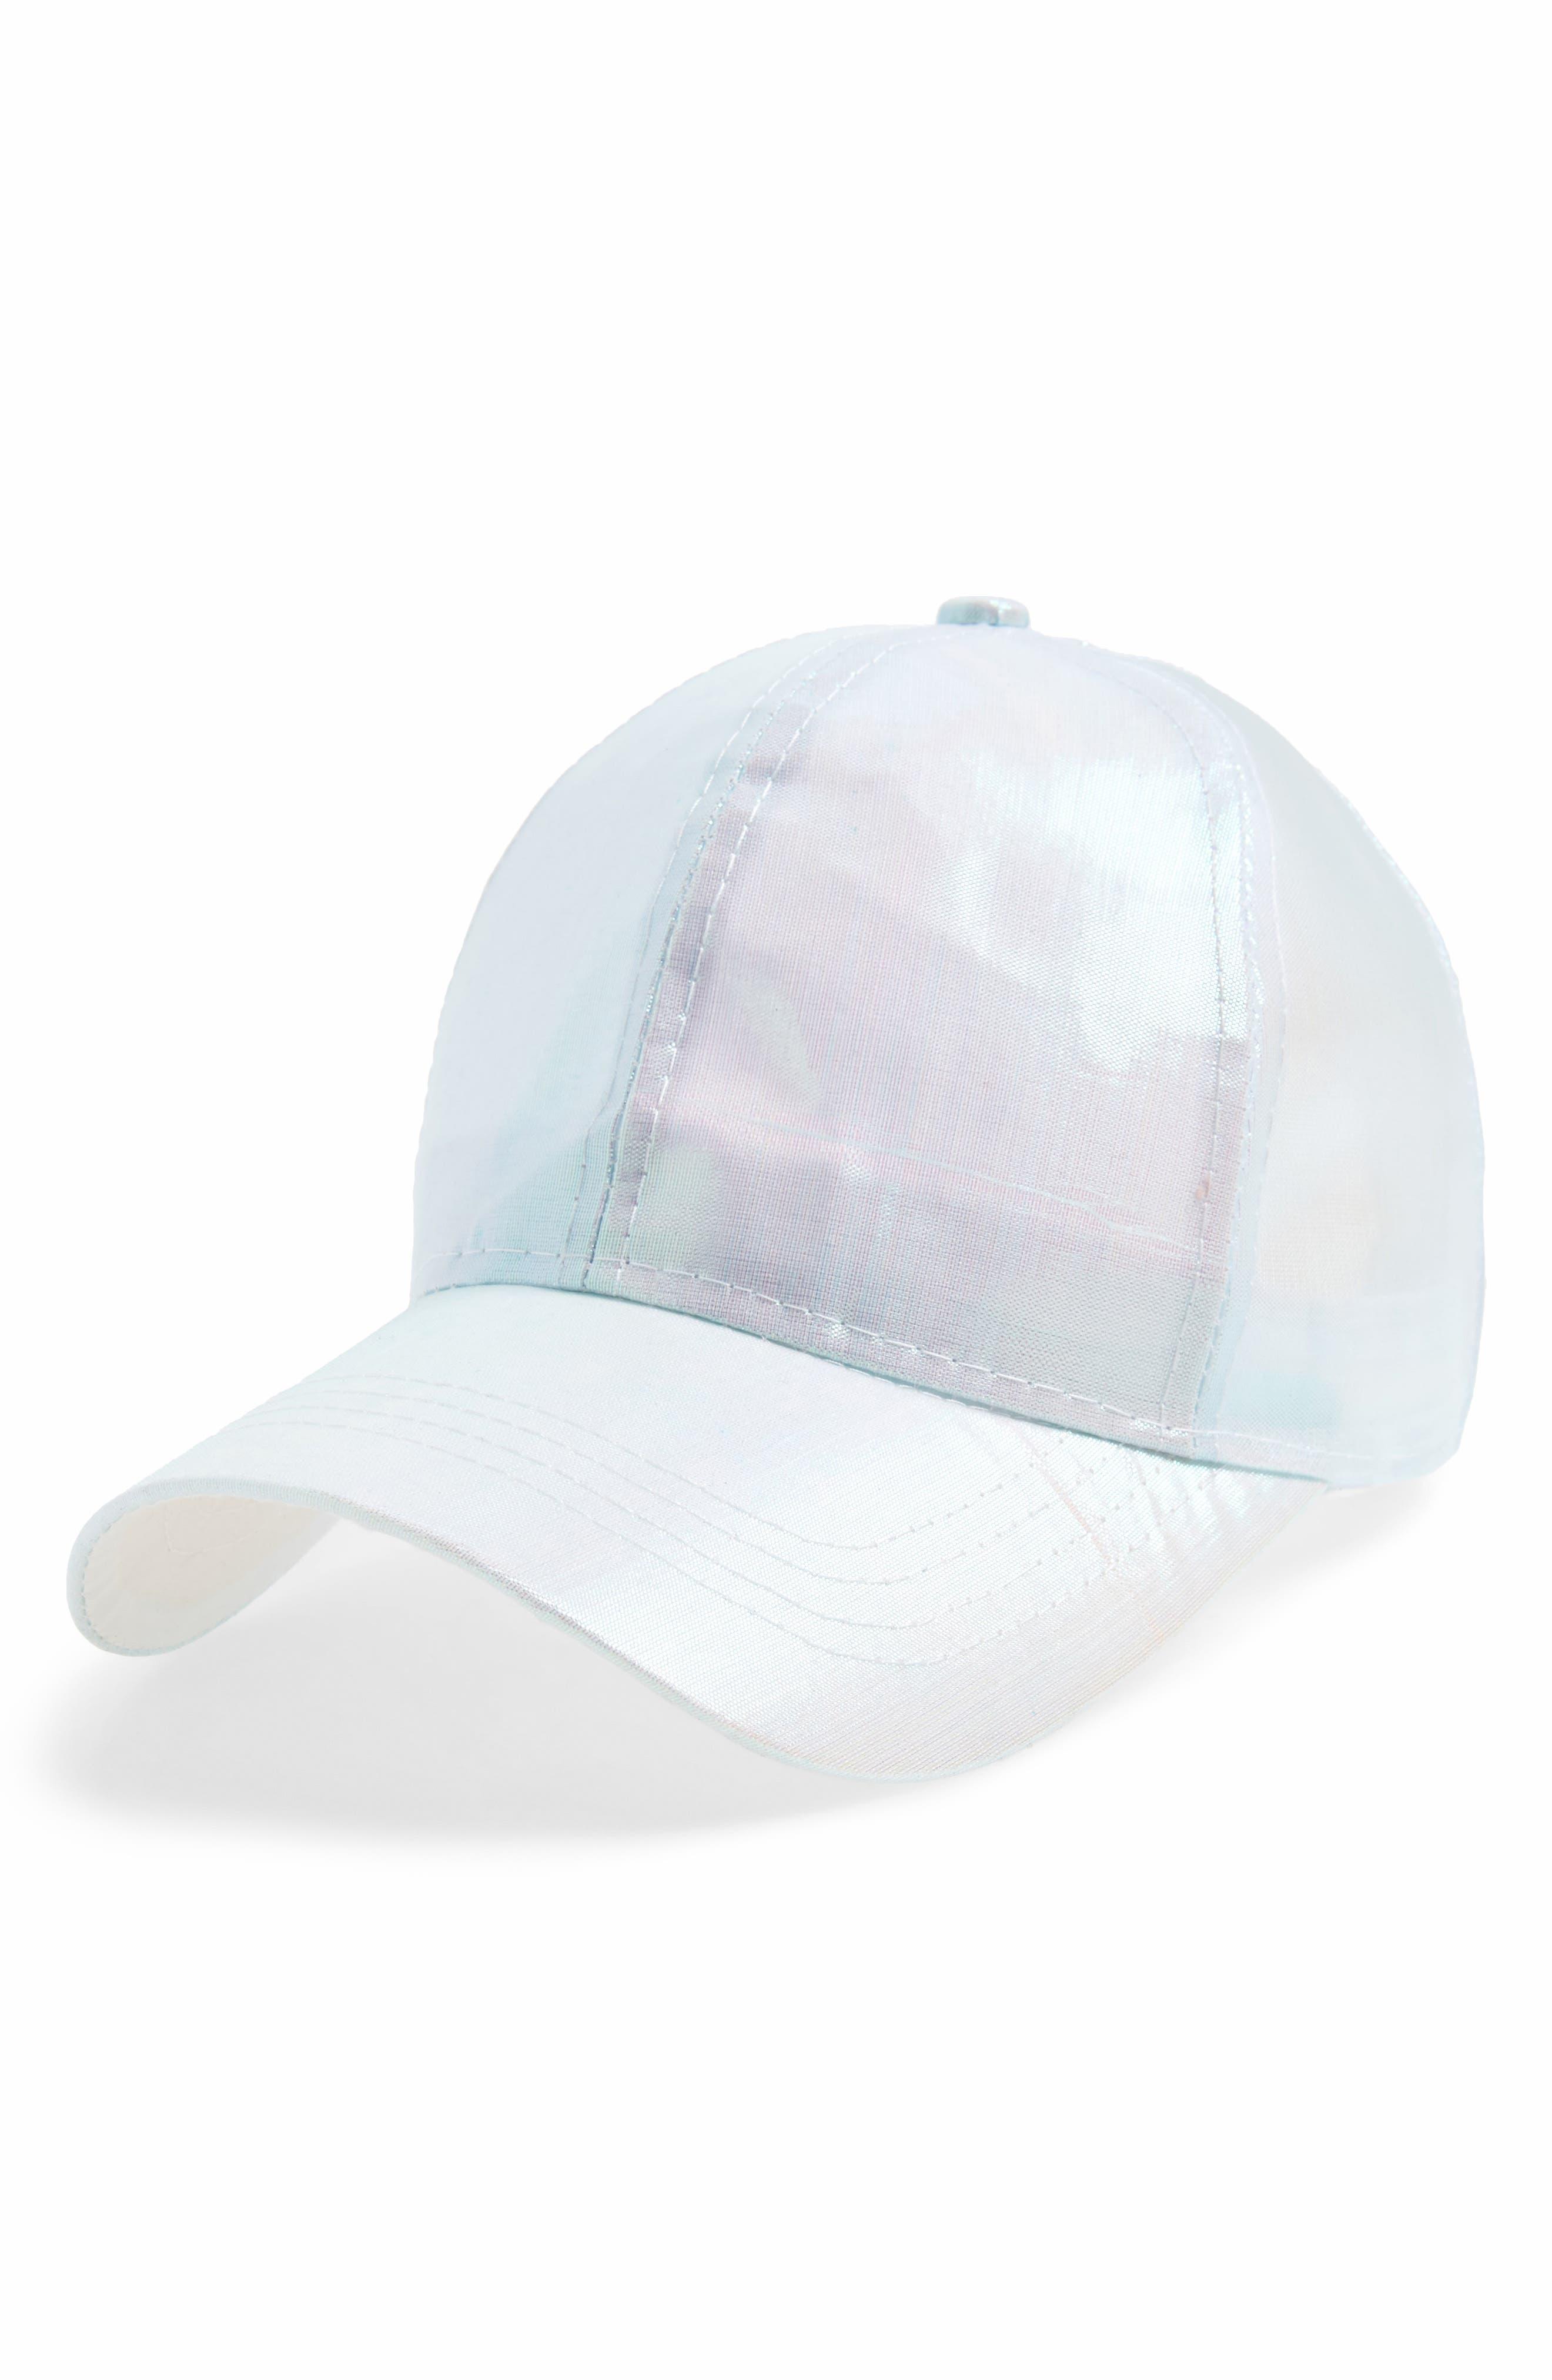 Cara Iridescent Ball Cap,                             Main thumbnail 1, color,                             Blue Irridescant